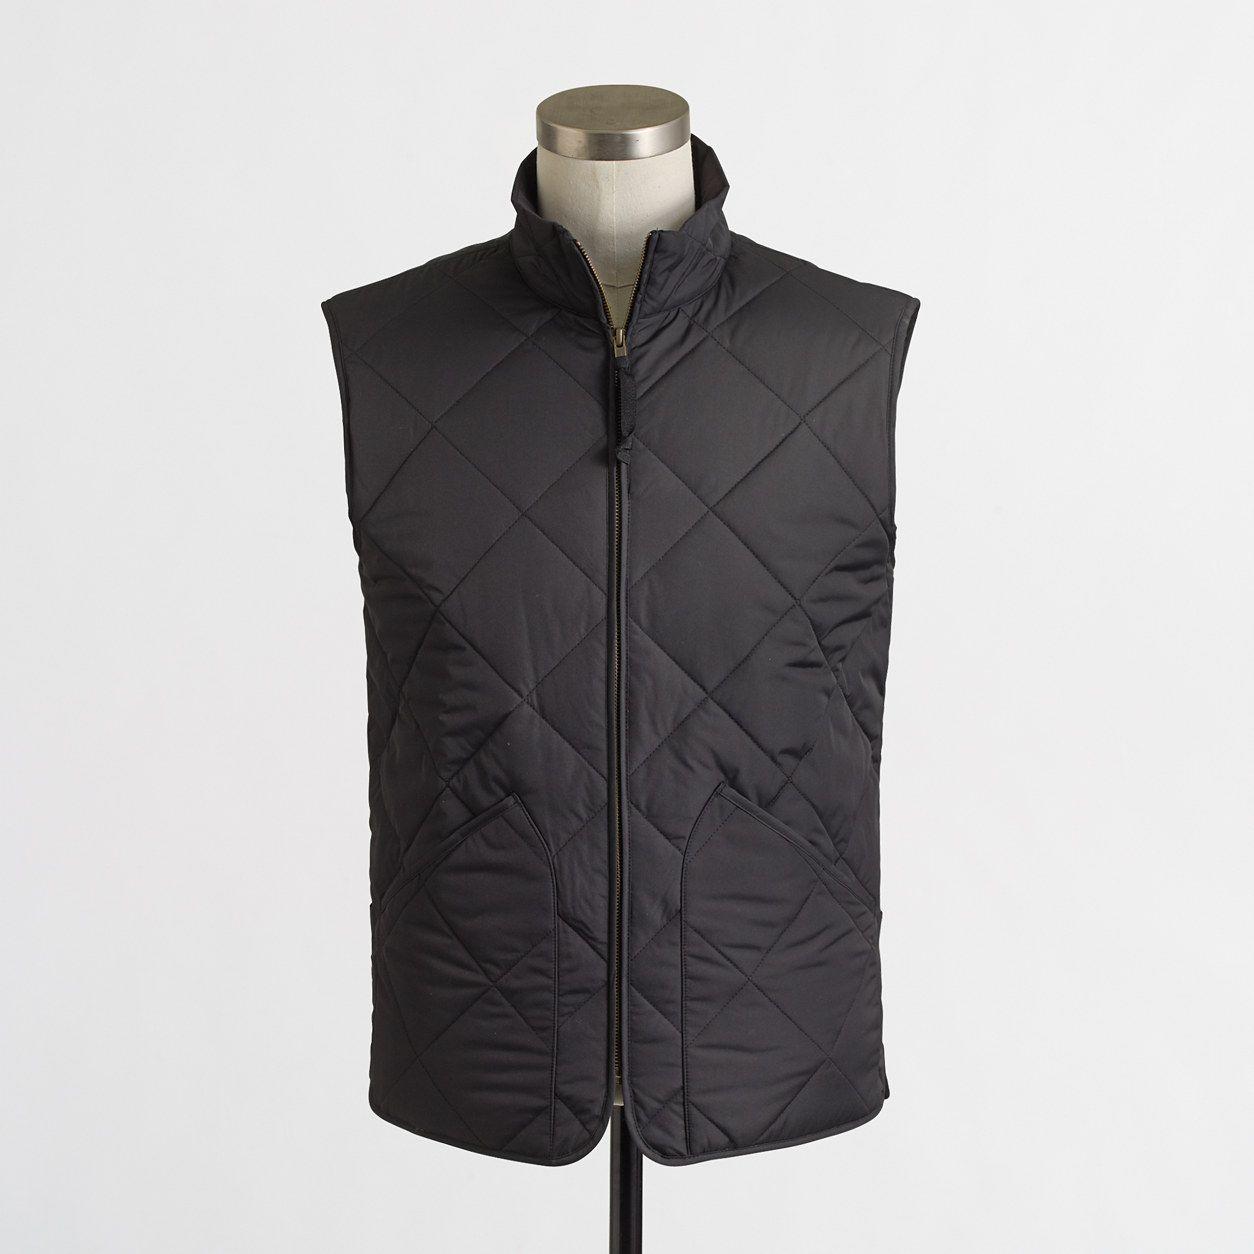 Walker Vest : Men's Jackets & Outerwear | J.Crew Factory | Basics ...